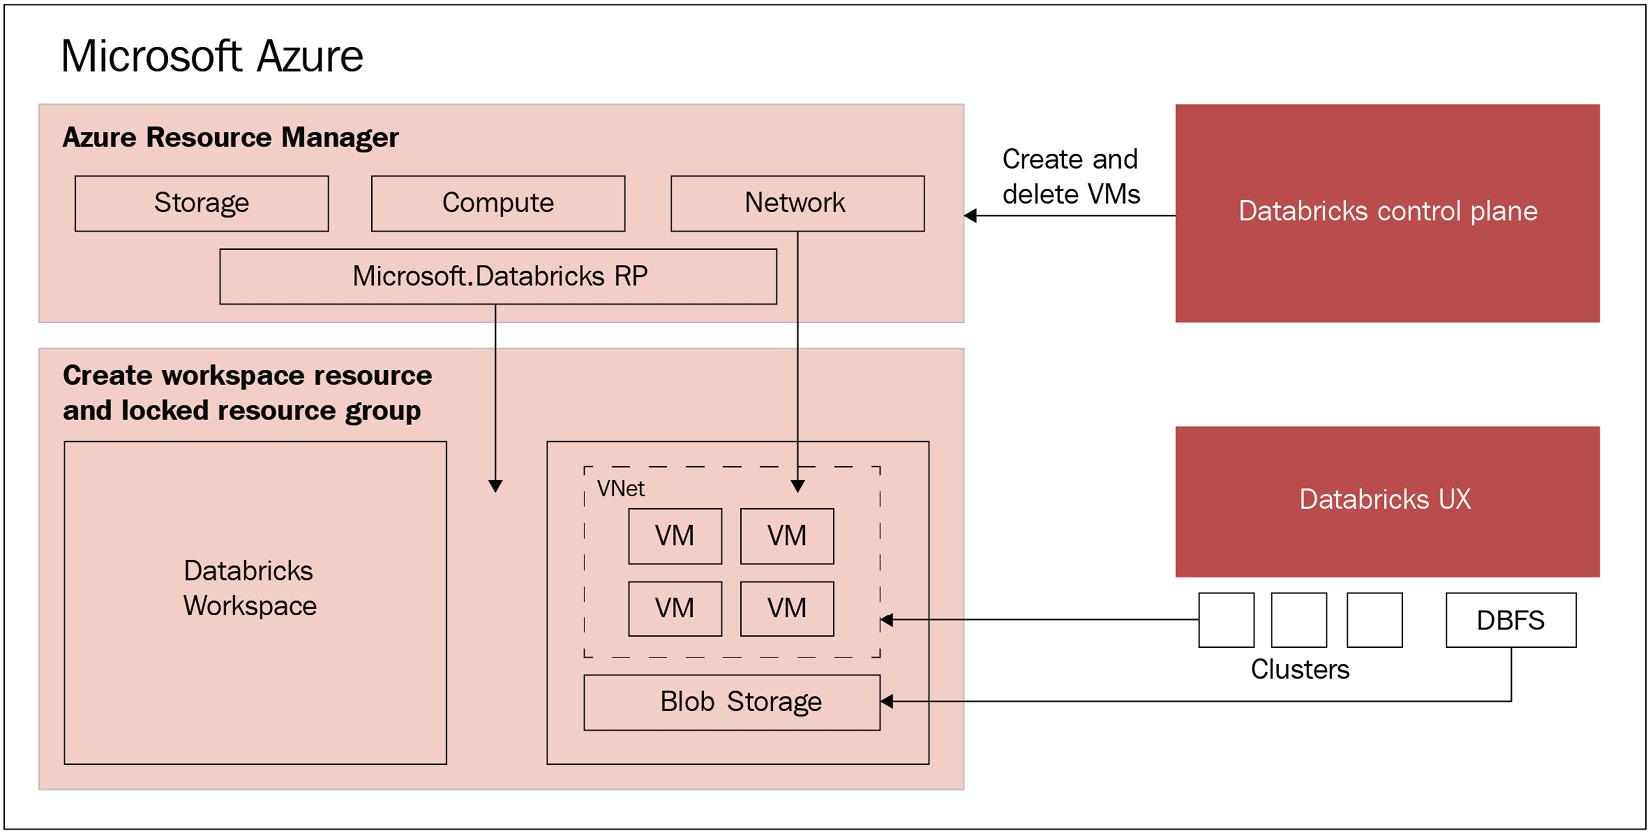 Figure 1.1 – Databricks architecture